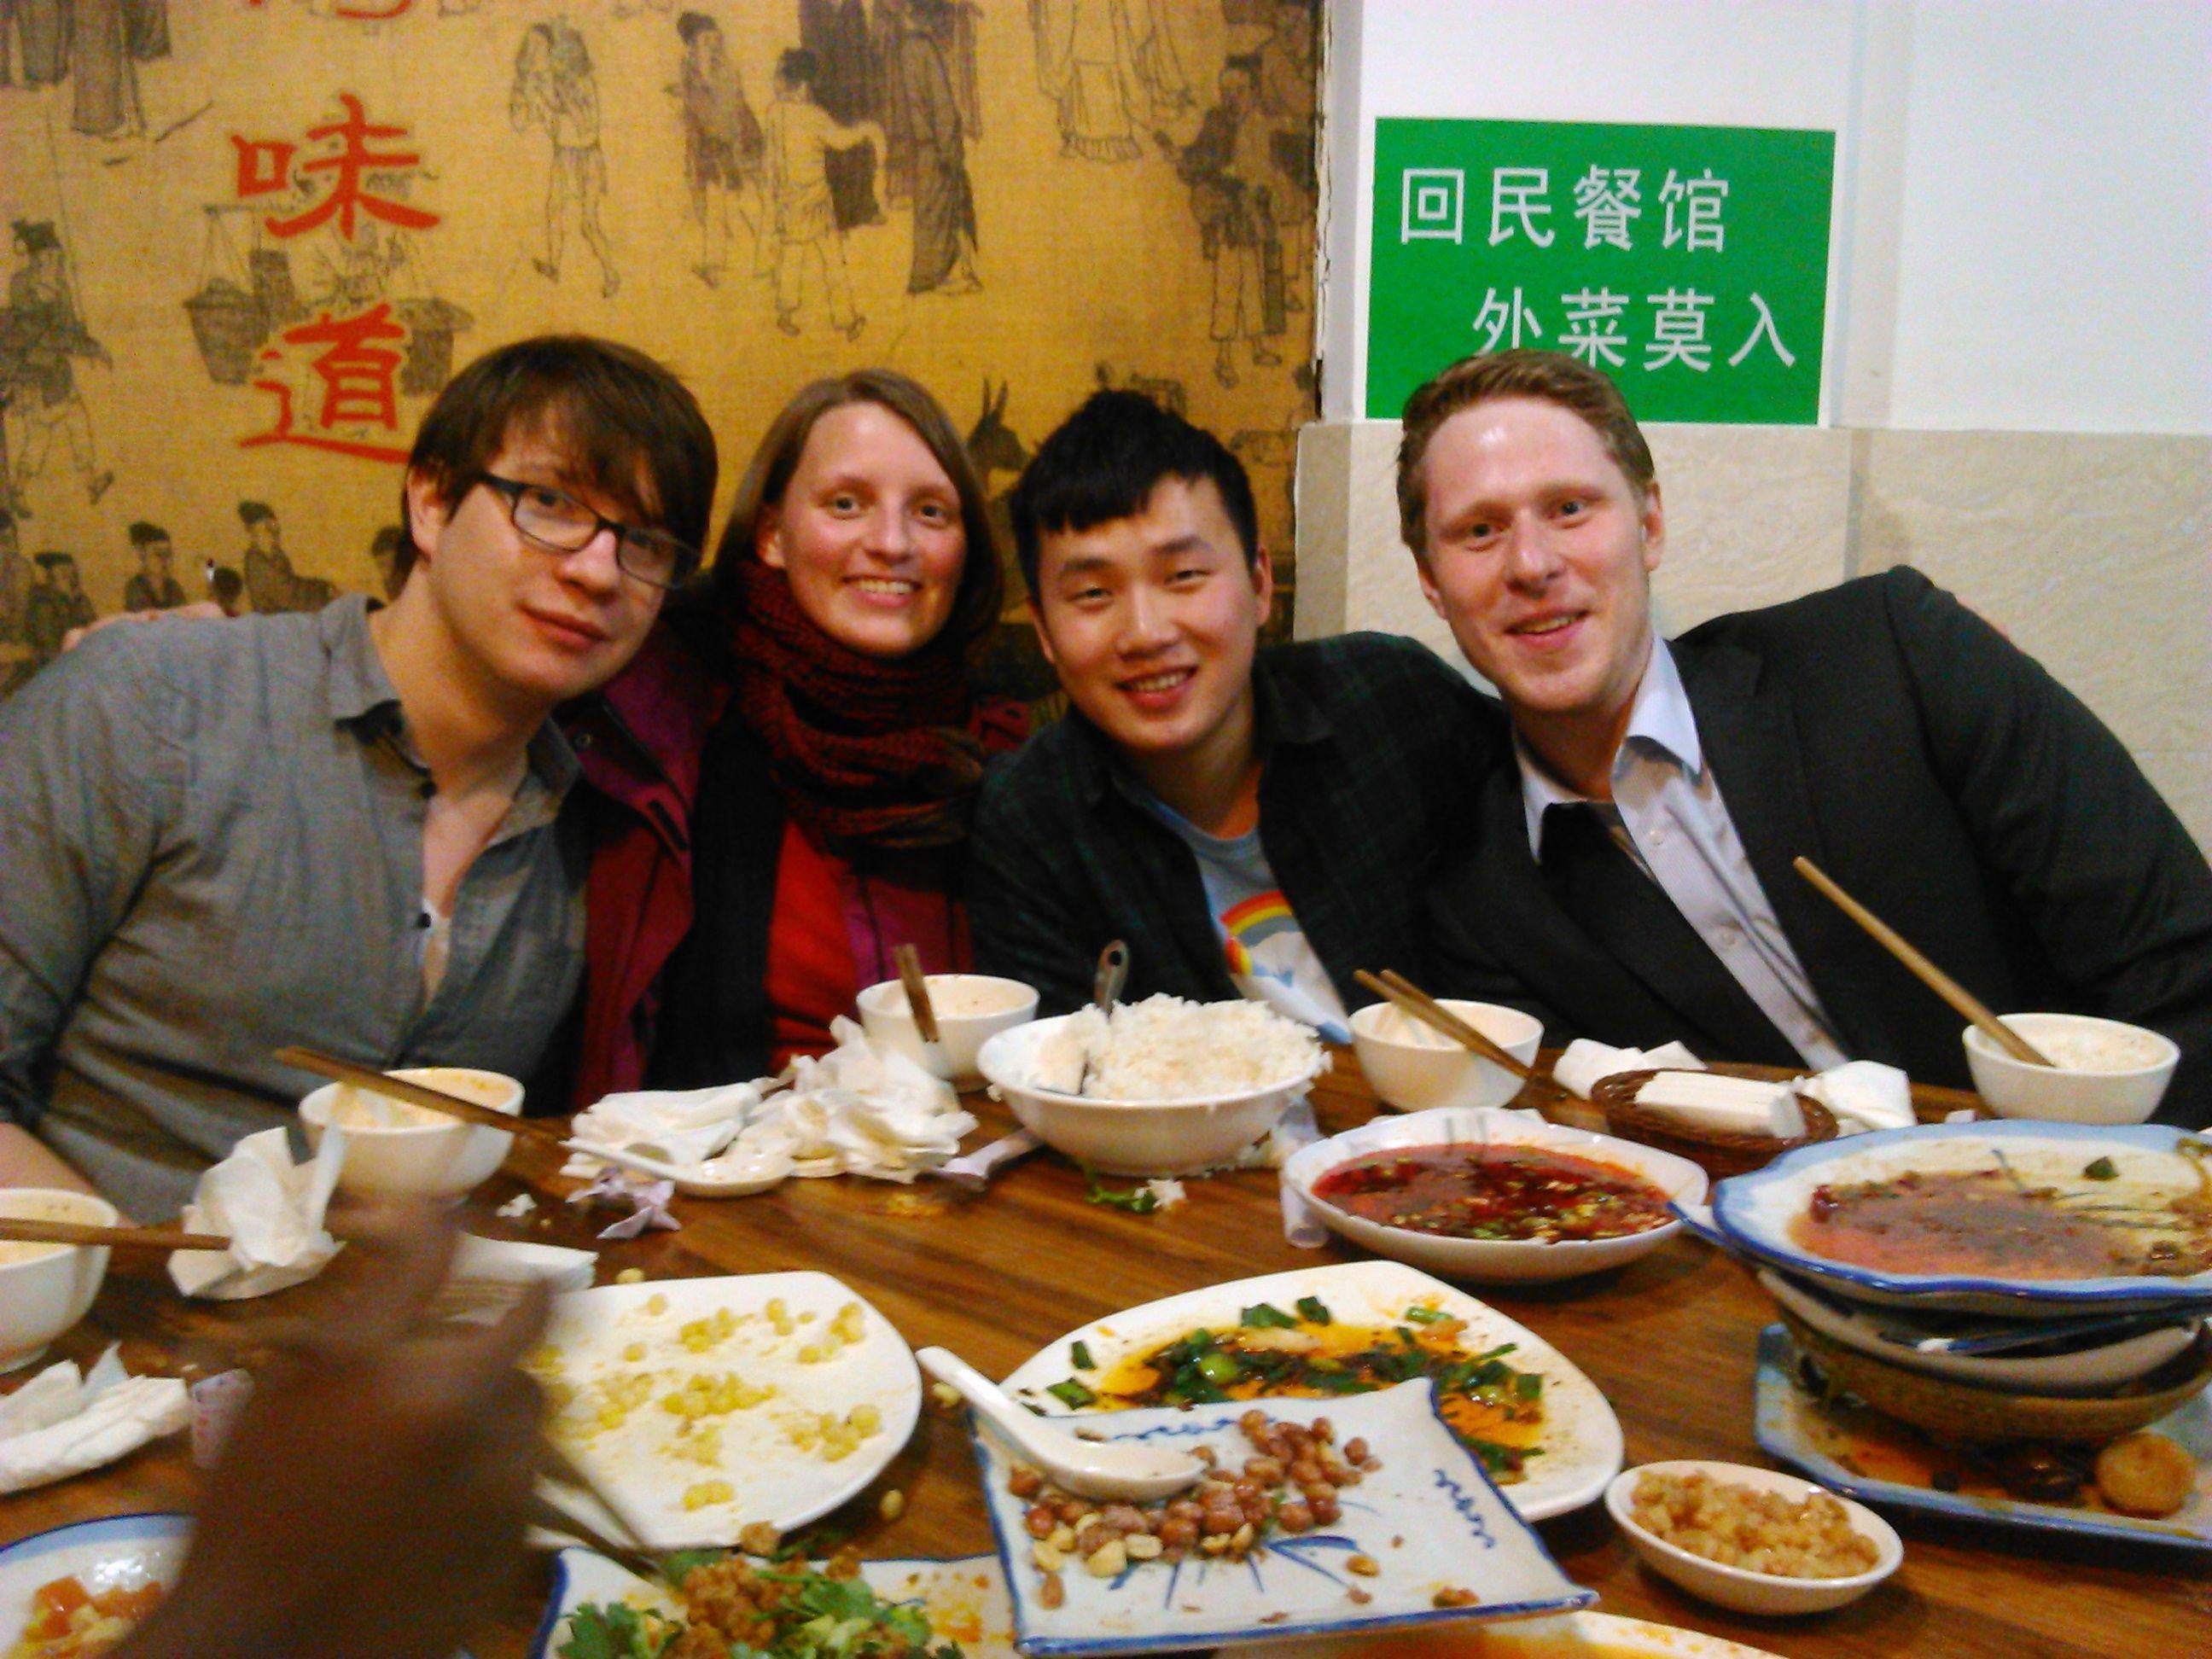 Chengdu Muslim Restaurant Yuexiangcun Beef Restaurant Tours China Sichuan Province Chengdu Synotrip